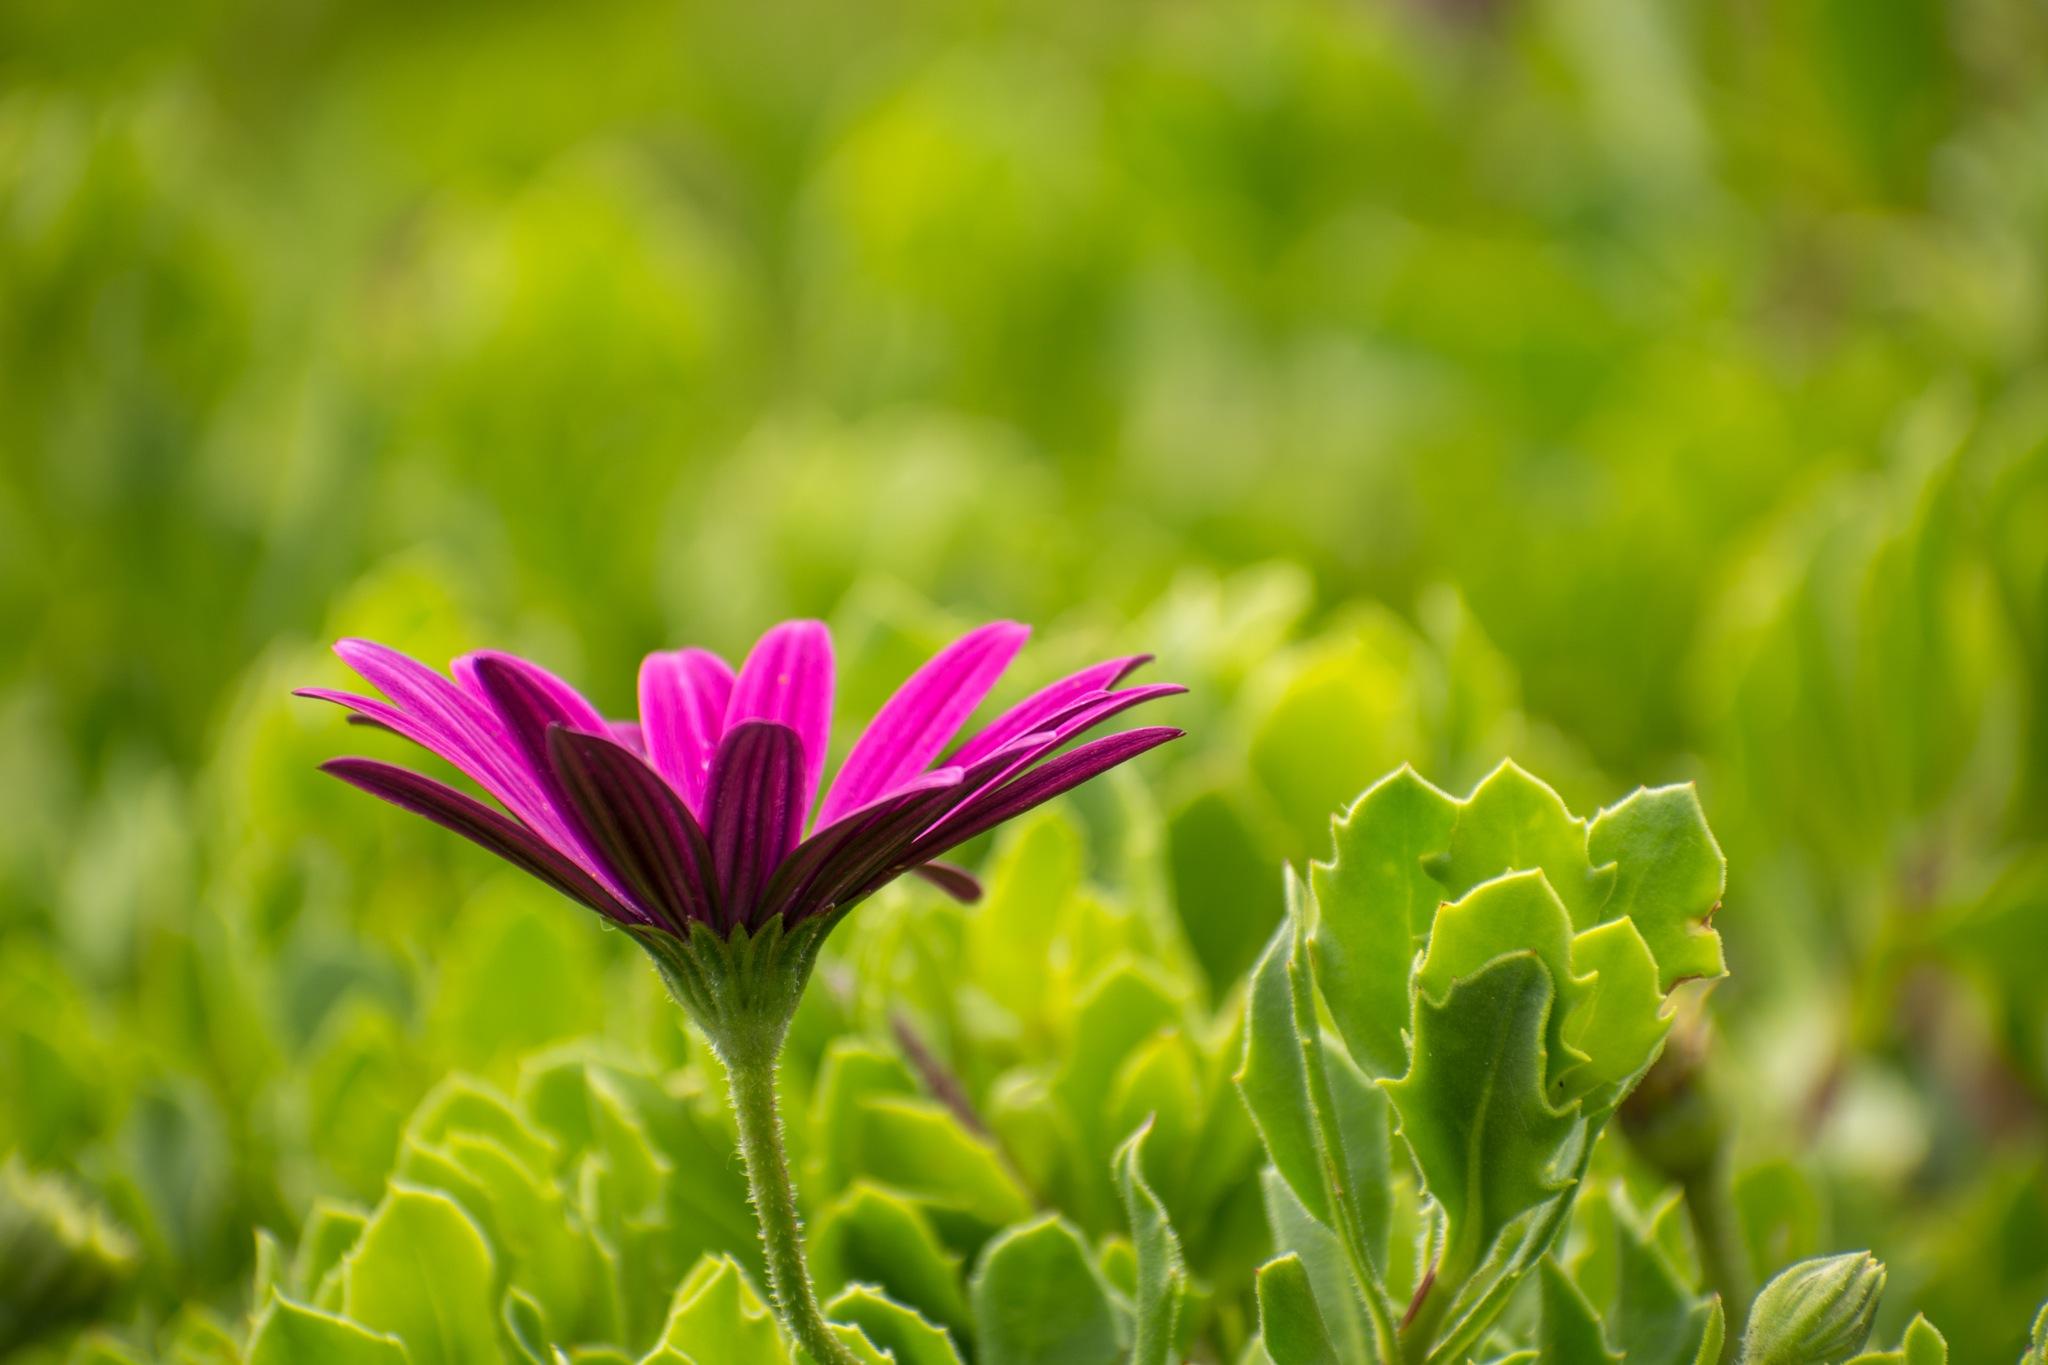 Flower by Bart Kluivingh Fotografie